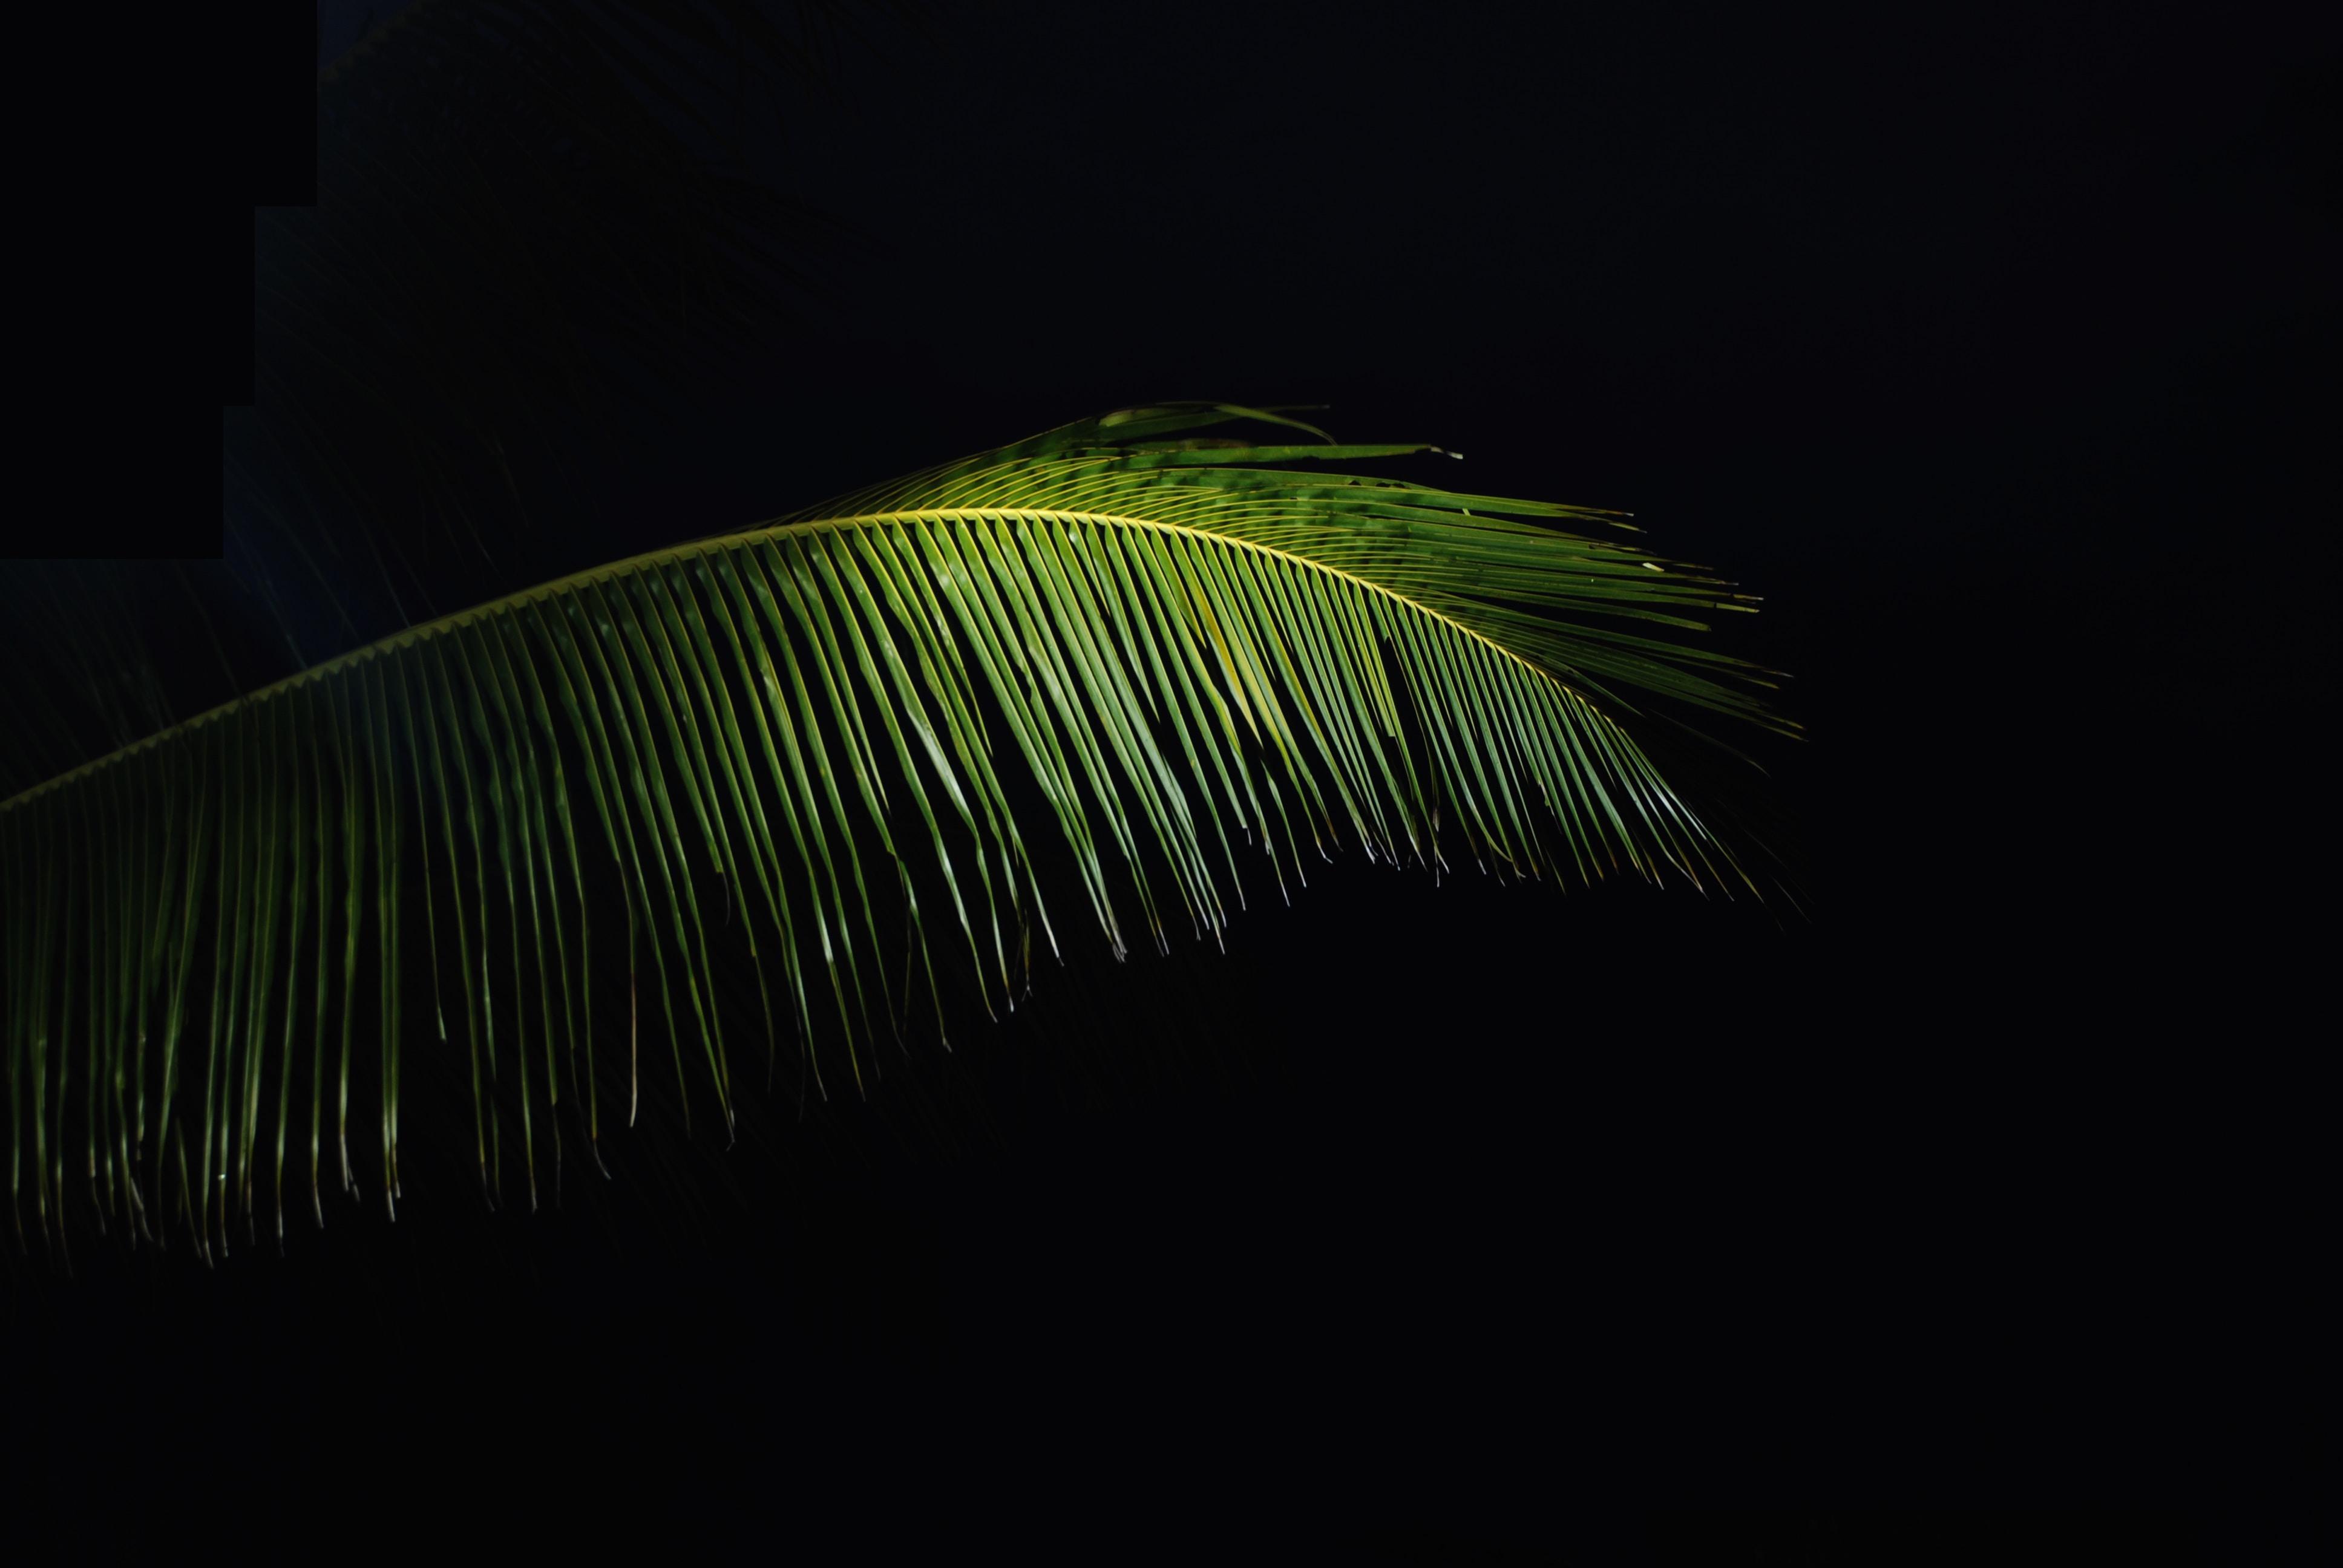 green coconut tree leaf